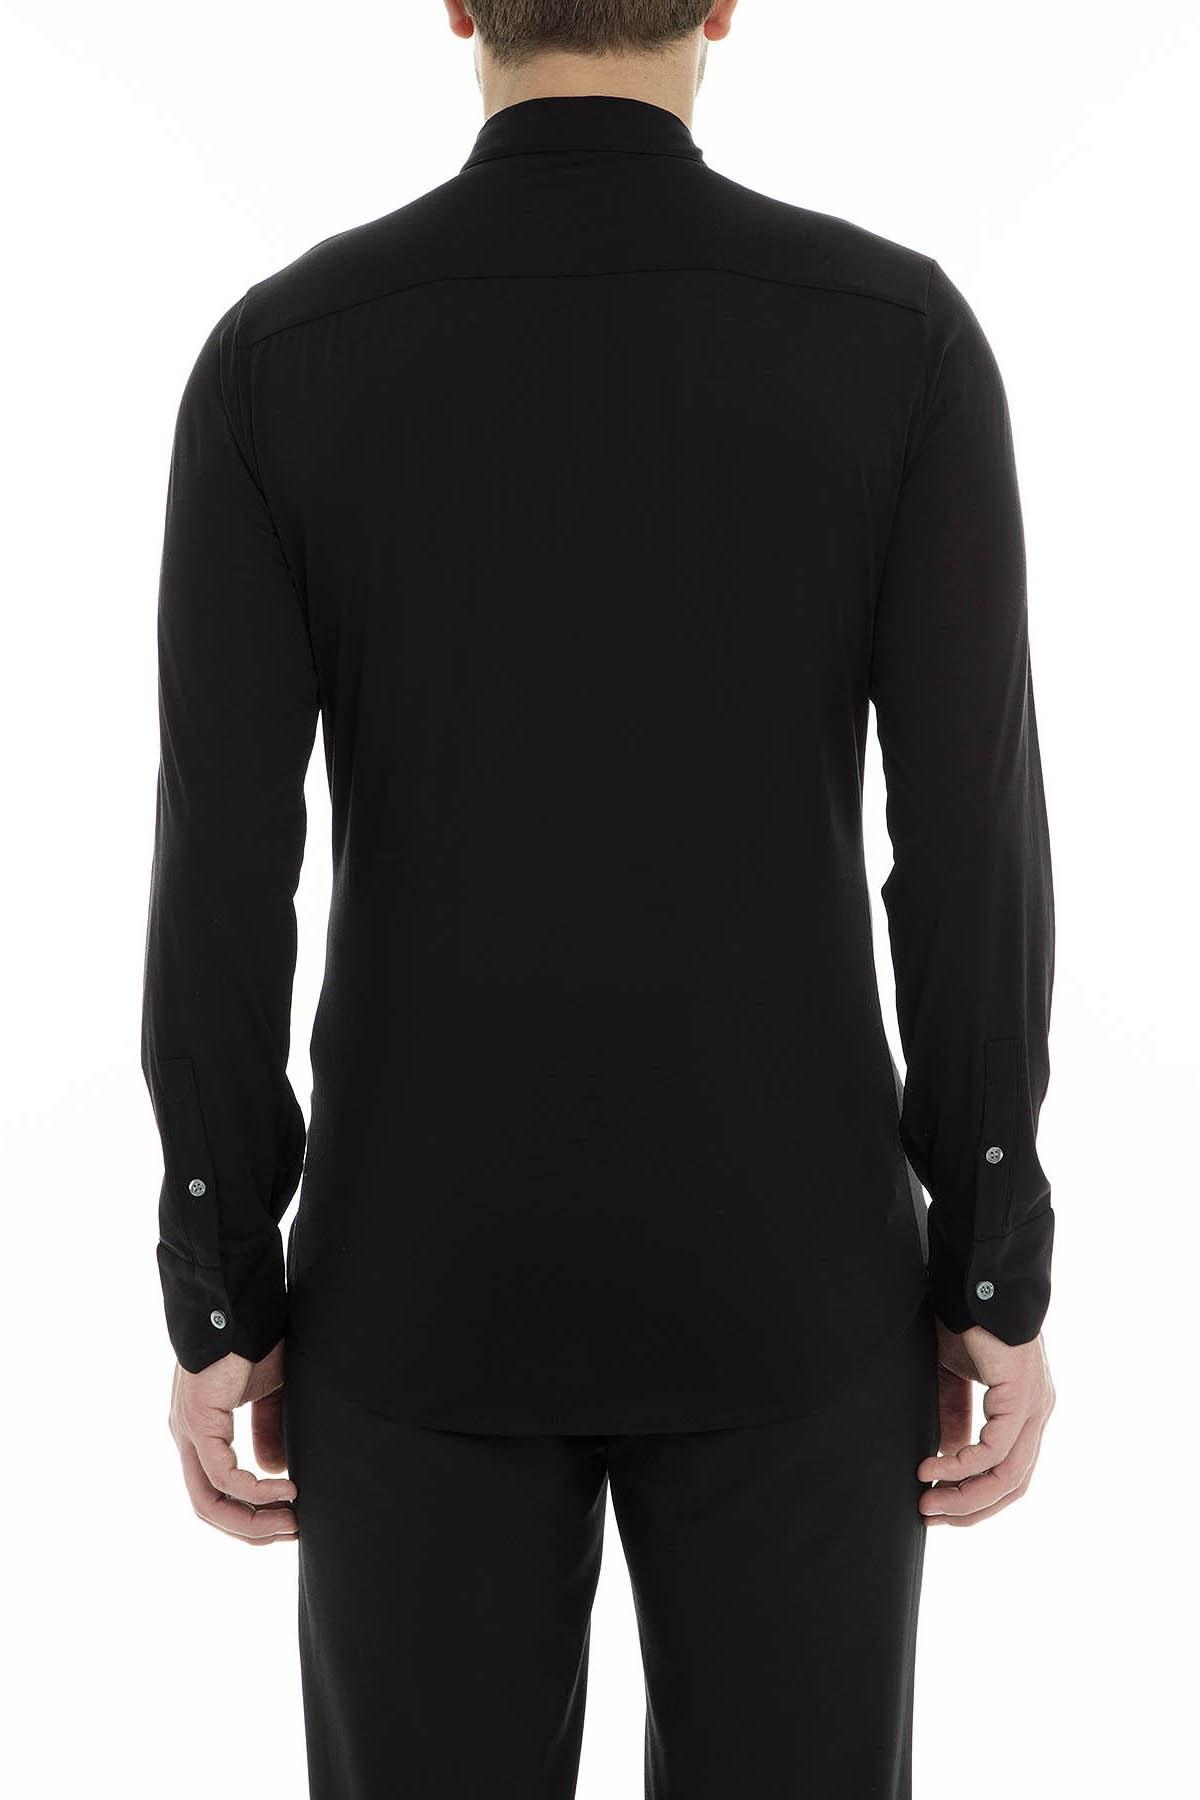 Emporio Armani Erkek Gömlek 3G1CL5 1JQXZ 0999 SİYAH